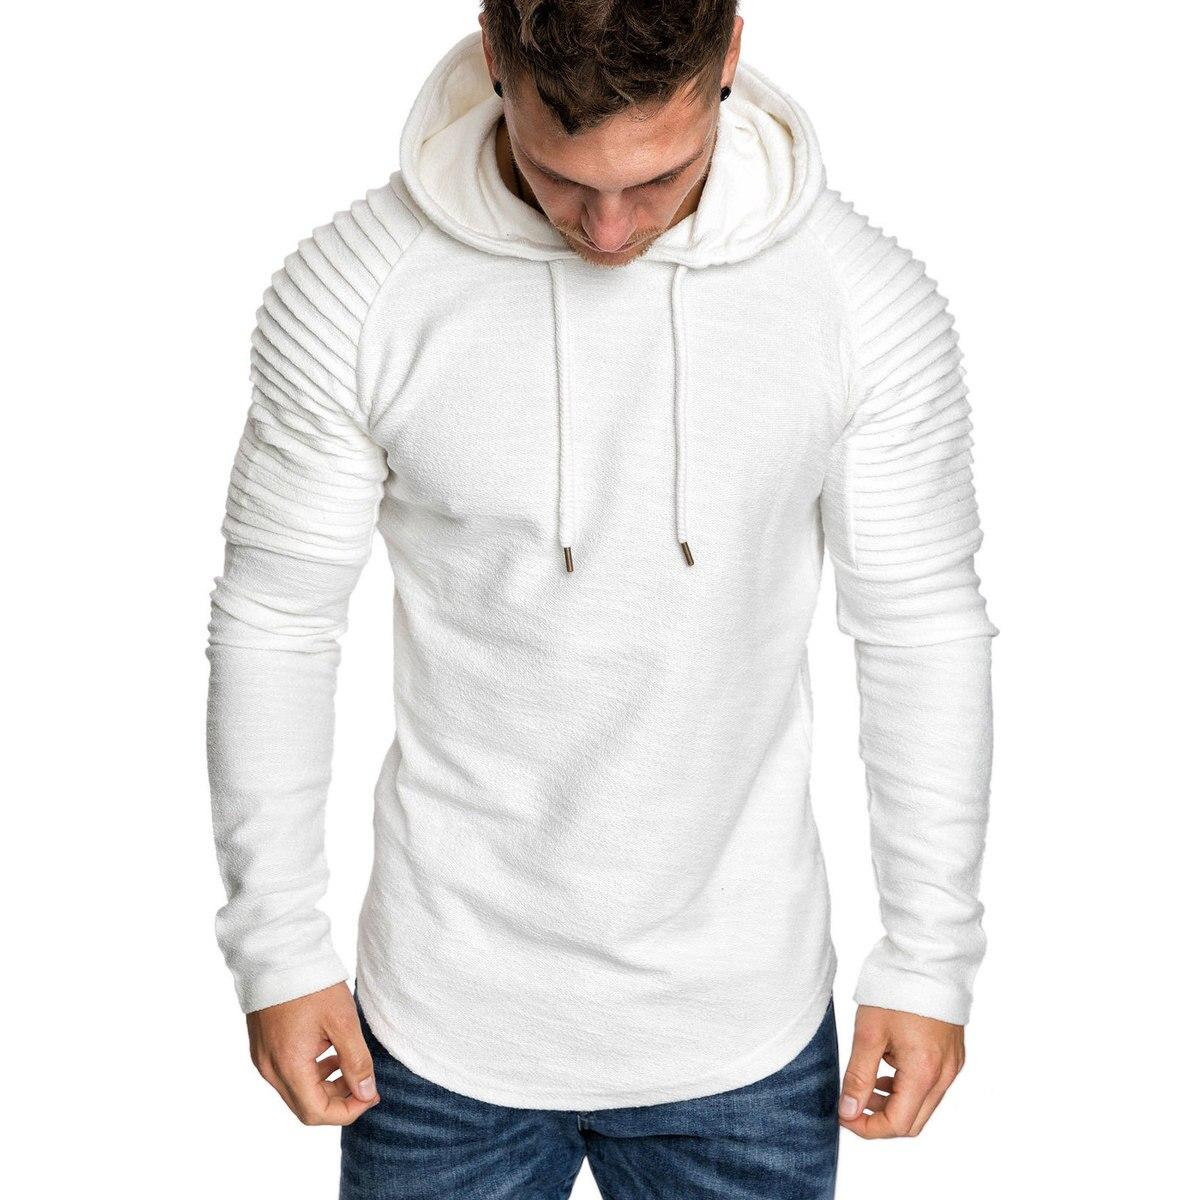 Moomphya Ragan sleeve hooded men t shirt Pleated sleeve t-shirt men Longline curved hem Hip hop slim tshirt streetwear tops 3